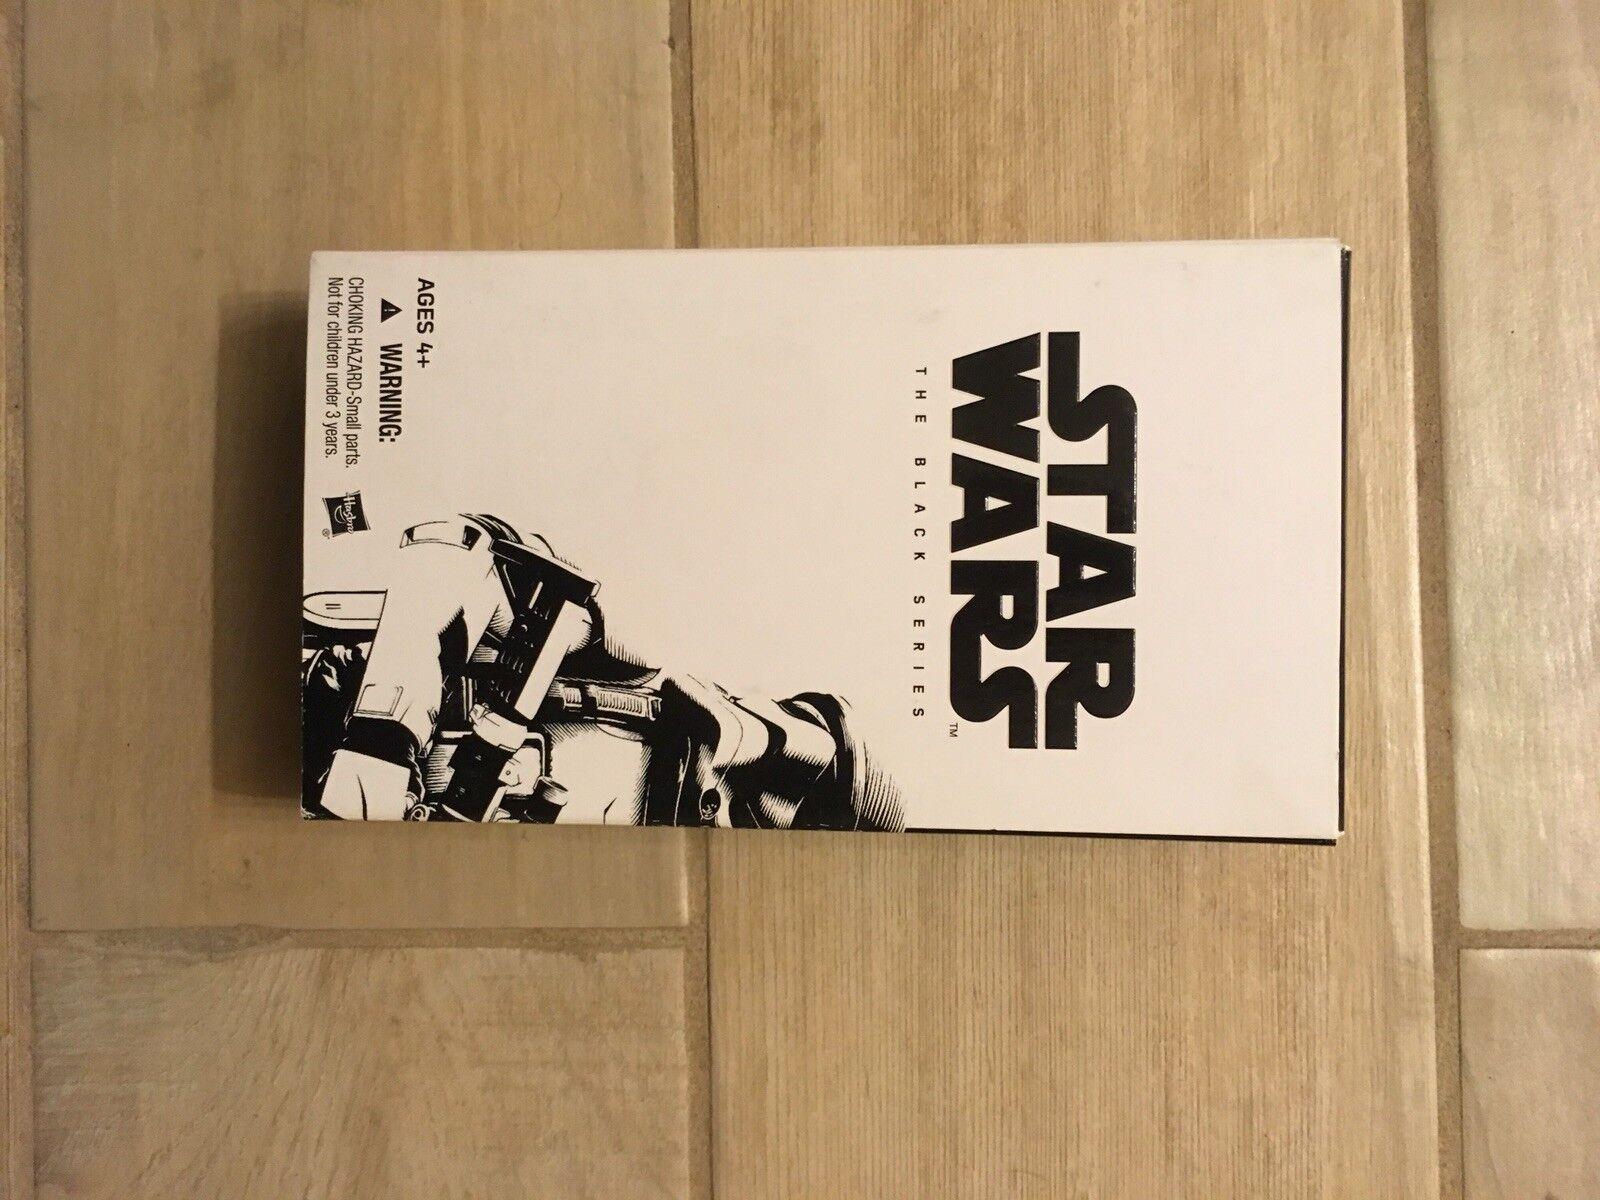 Hasbro - star - wars - der comic - con - 2015 um stormtrooper hp